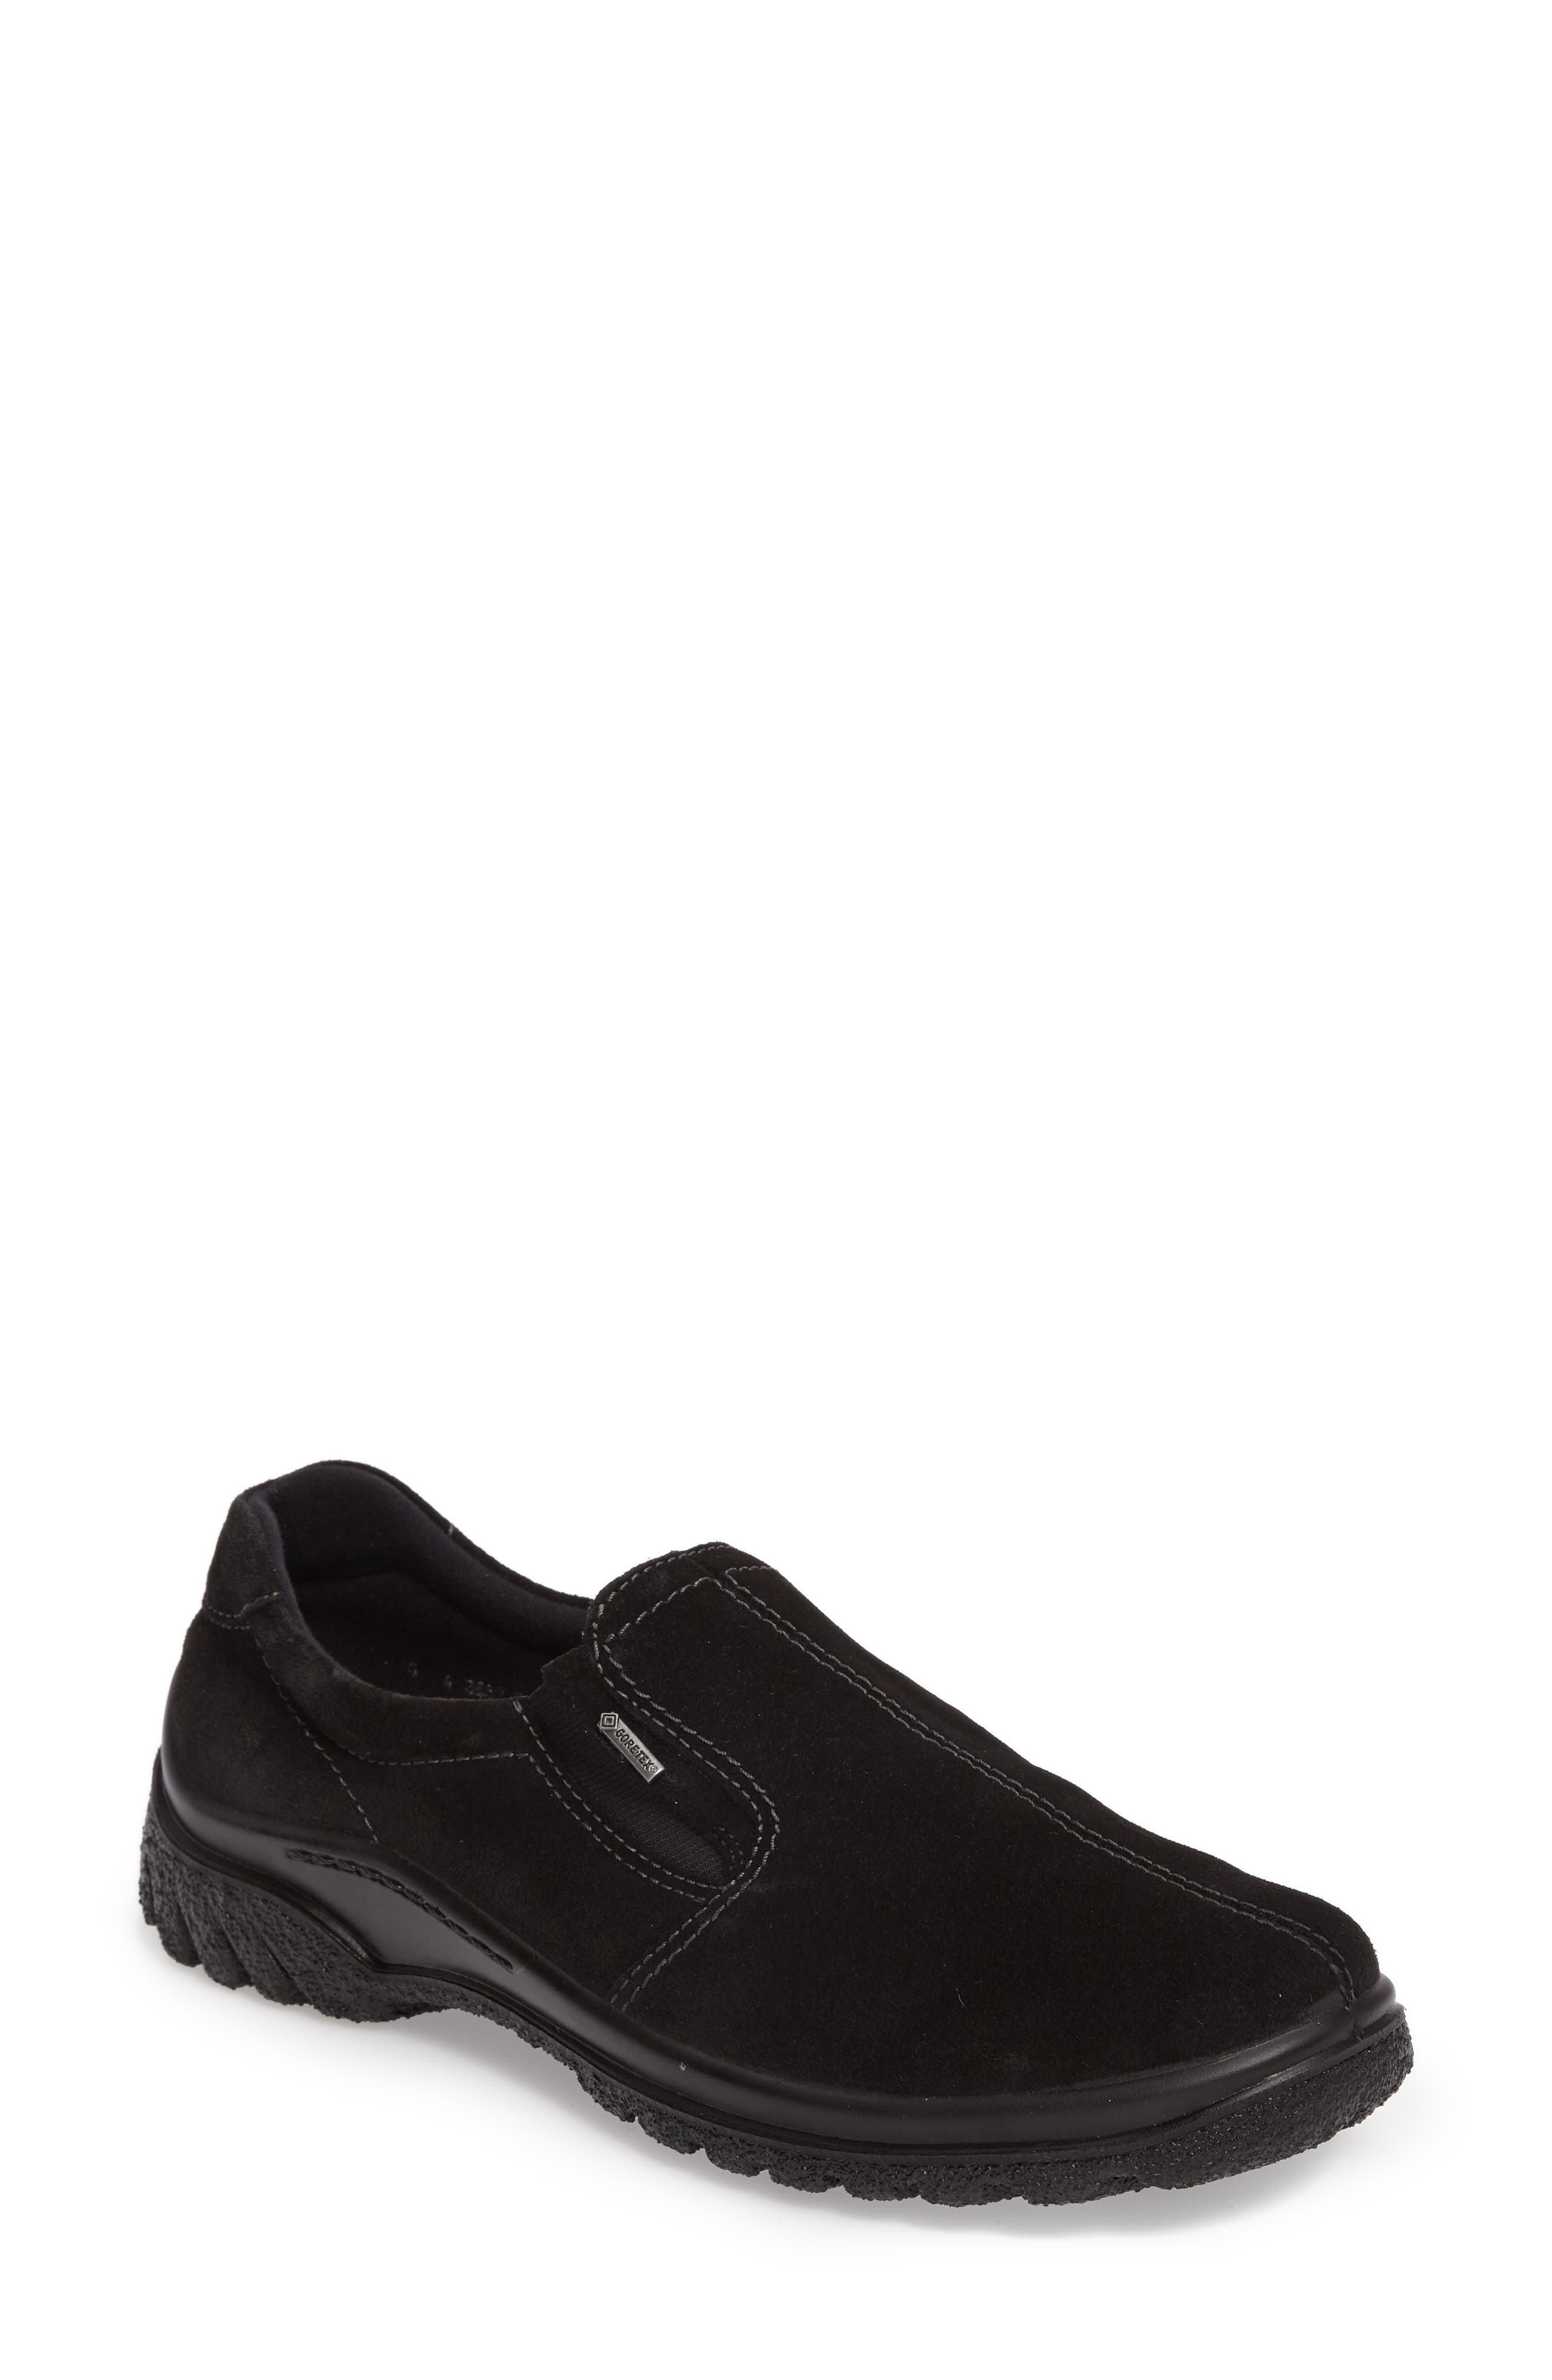 Parson Waterproof Gore-Tex<sup>®</sup> Slip-On Sneaker,                         Main,                         color, 001